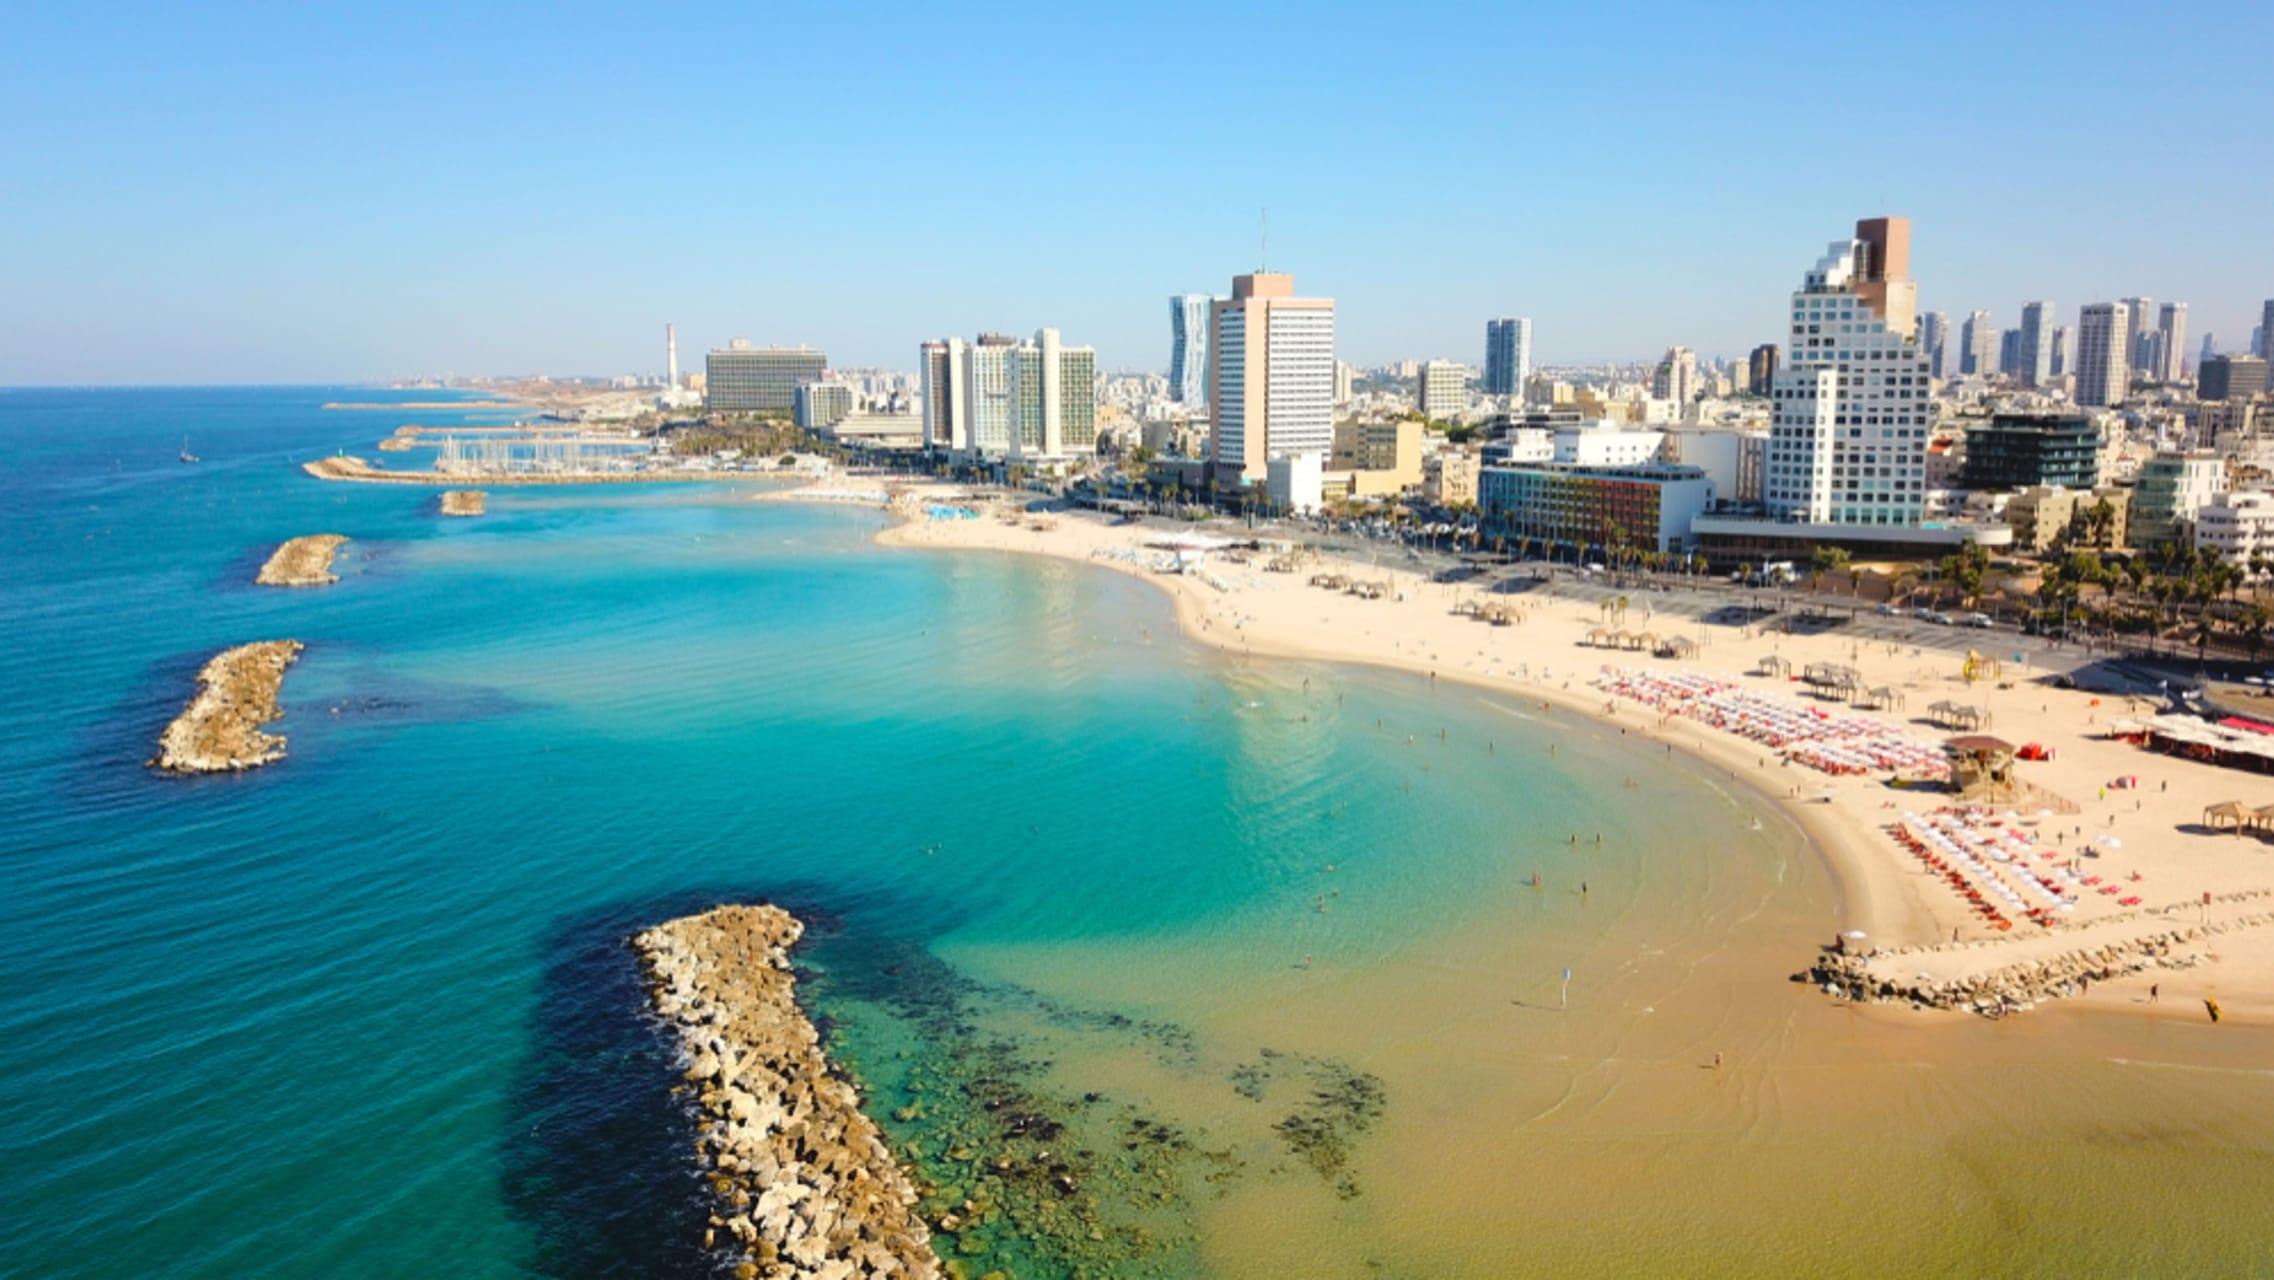 Tel Aviv - By popular demand: Tel Aviv Beach